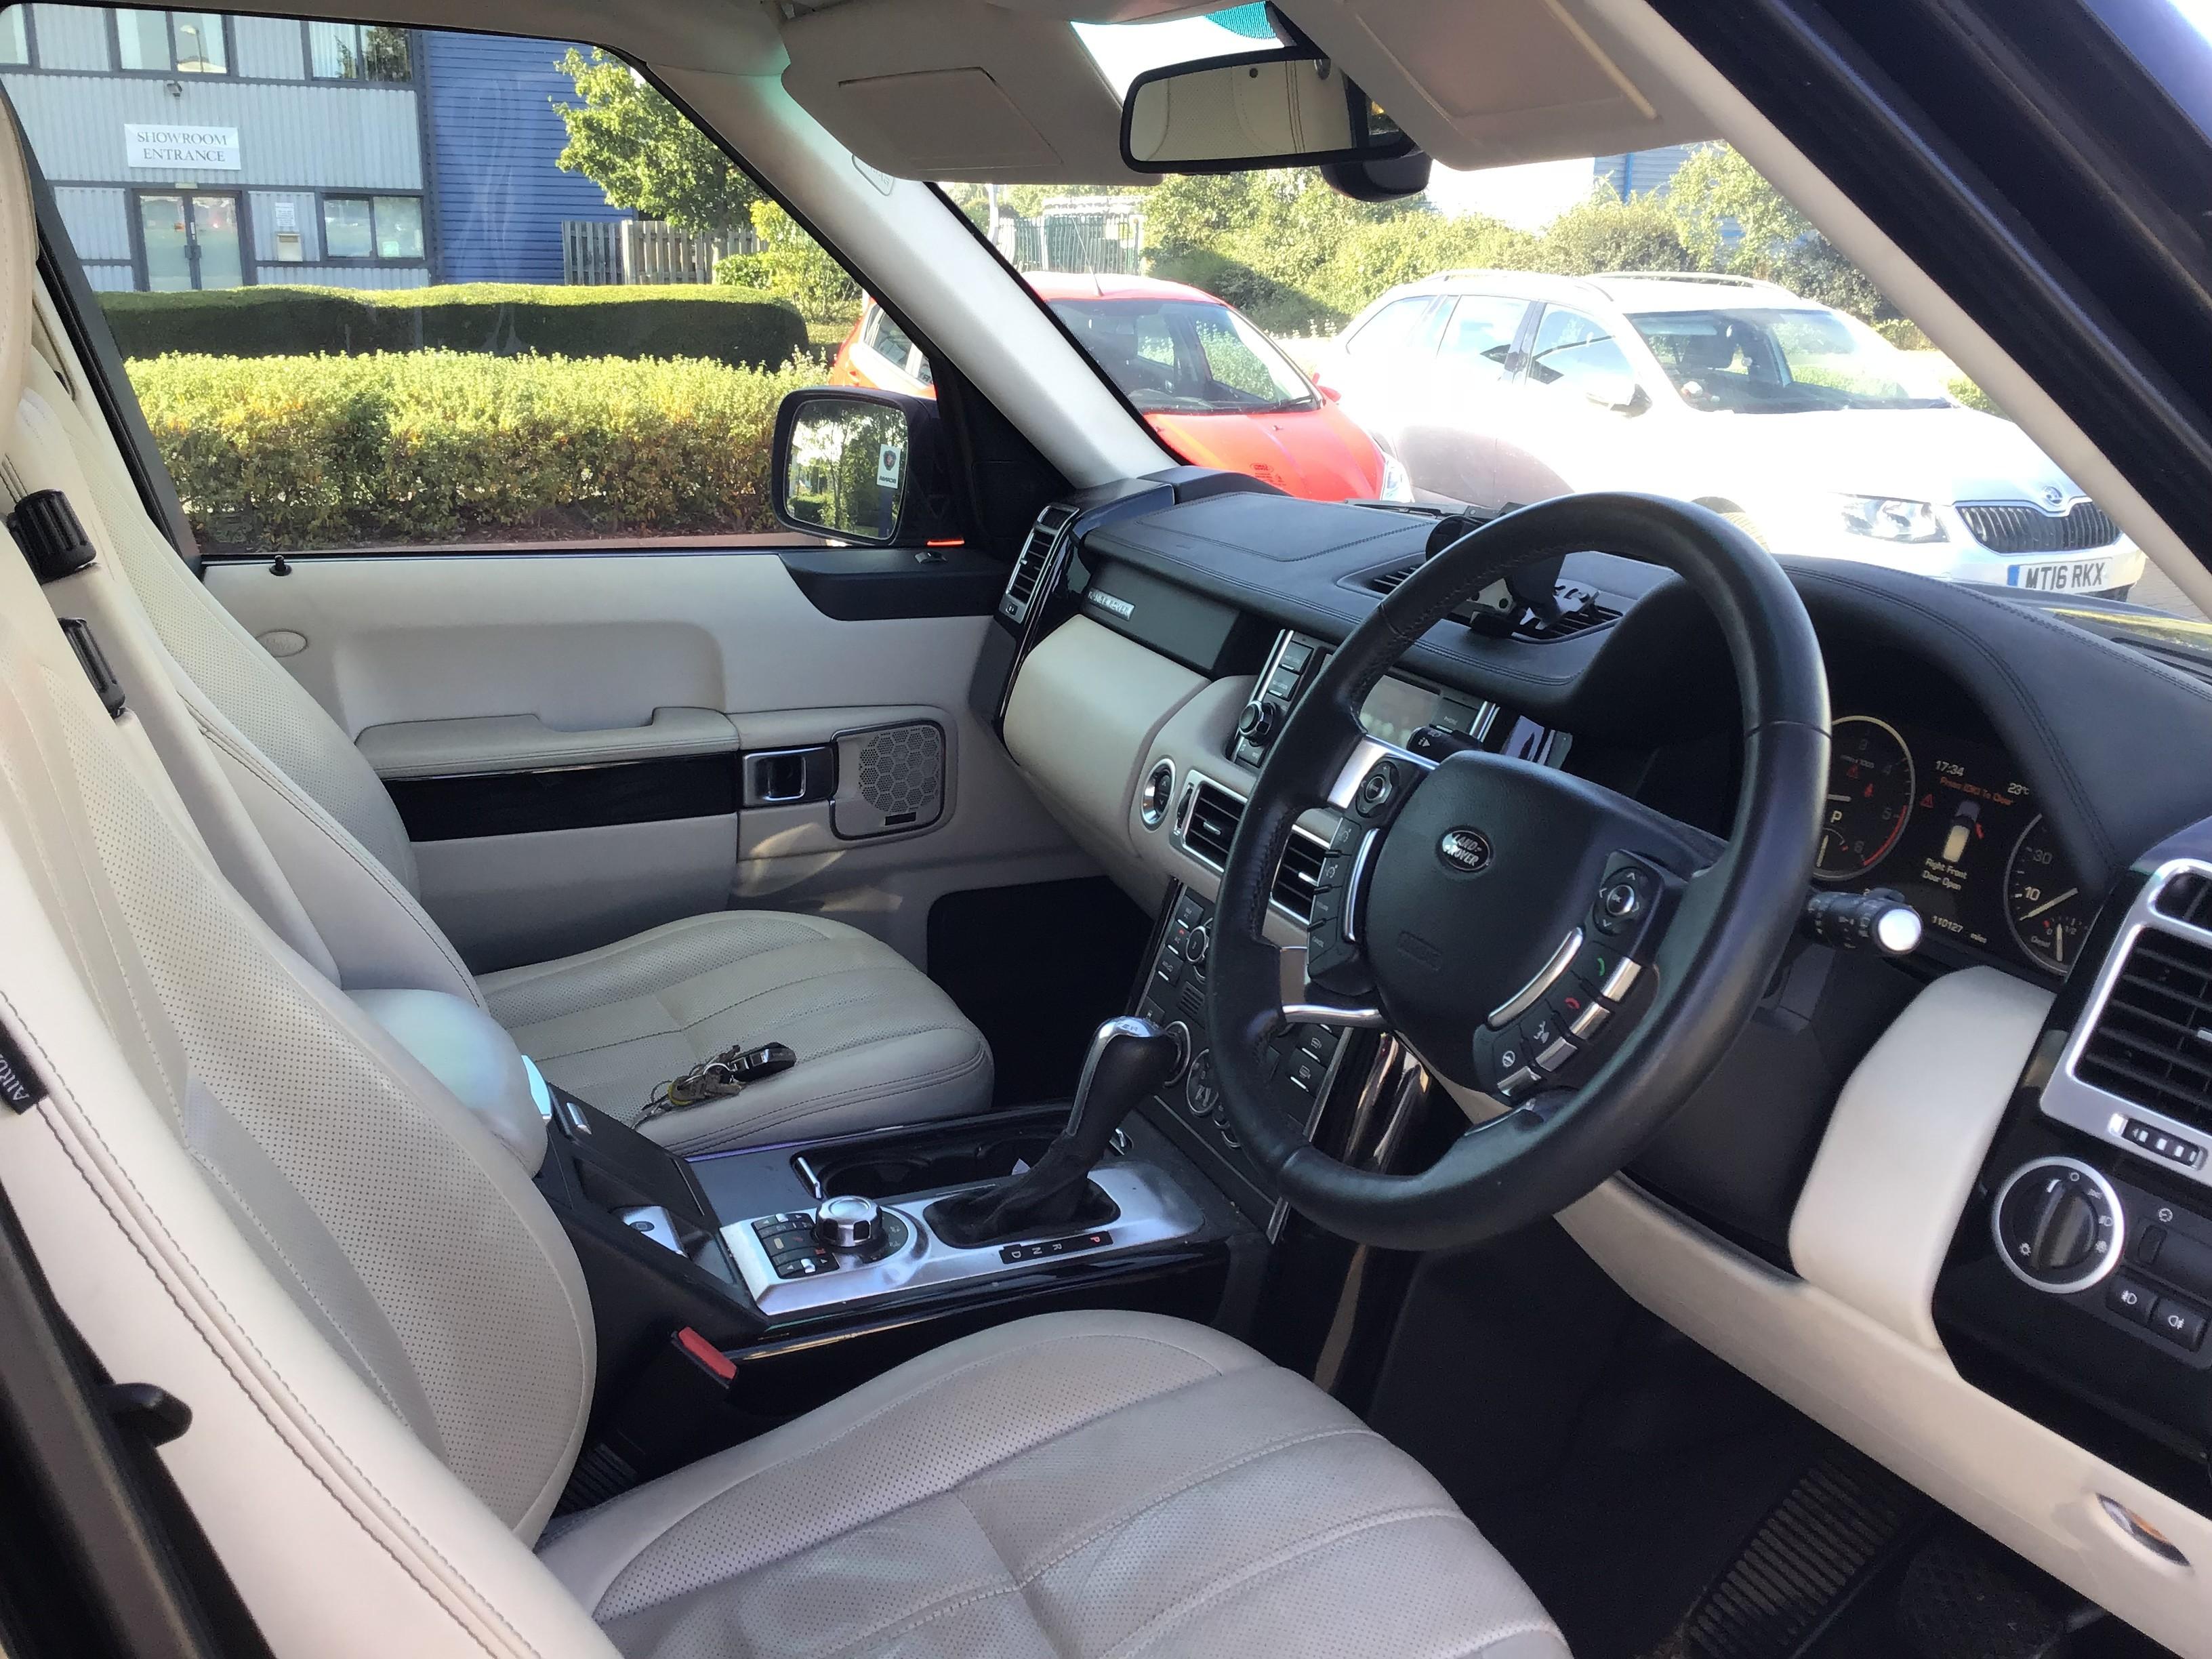 Range Rover 3.6 TDV8 Vogue SE 4dr Auto Interior 1